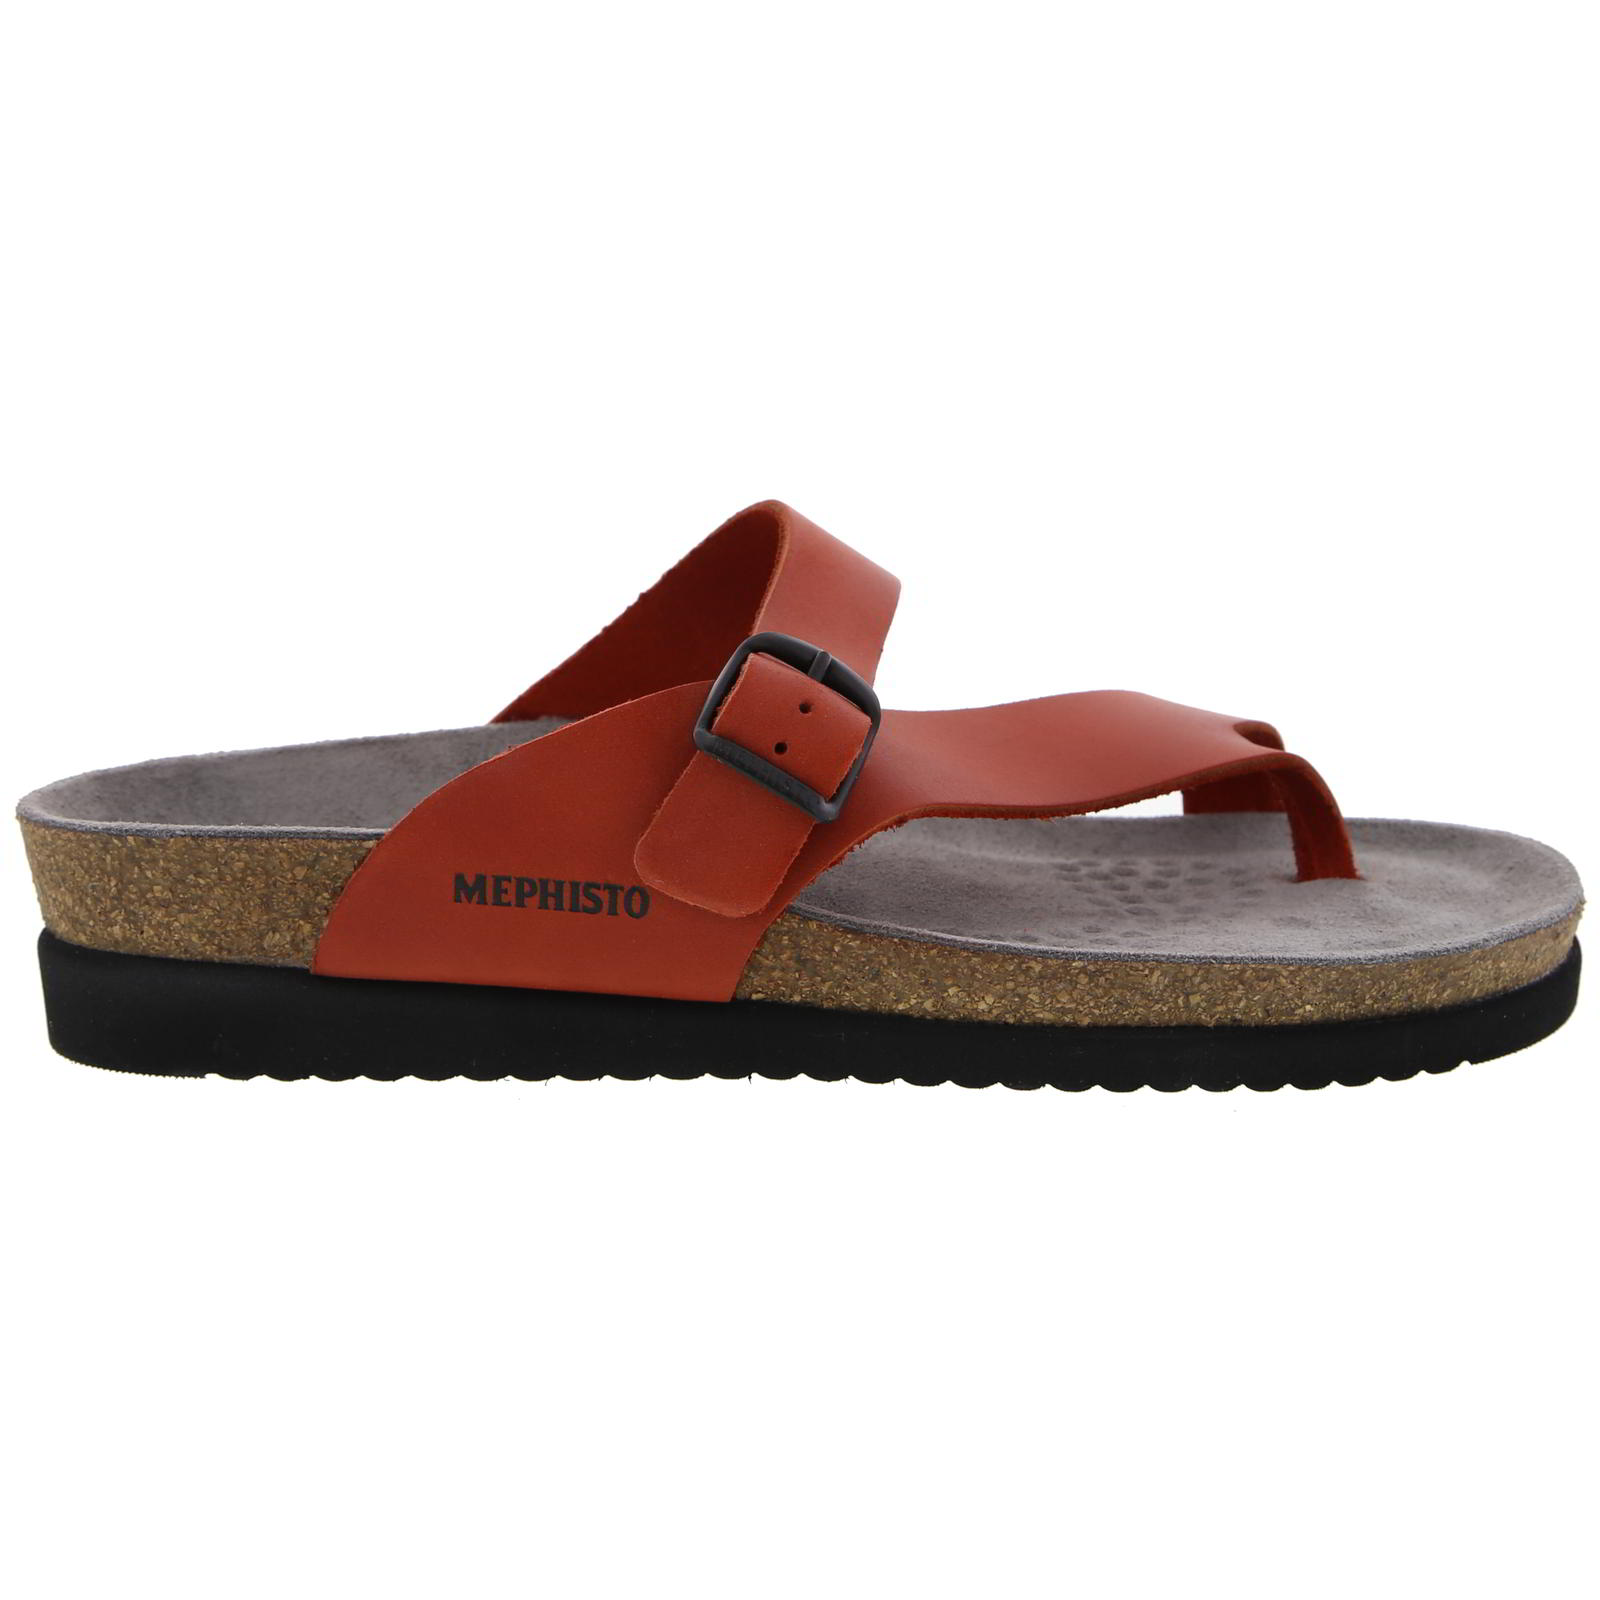 Mephisto Womens Helen Toe Post Sandals - Red